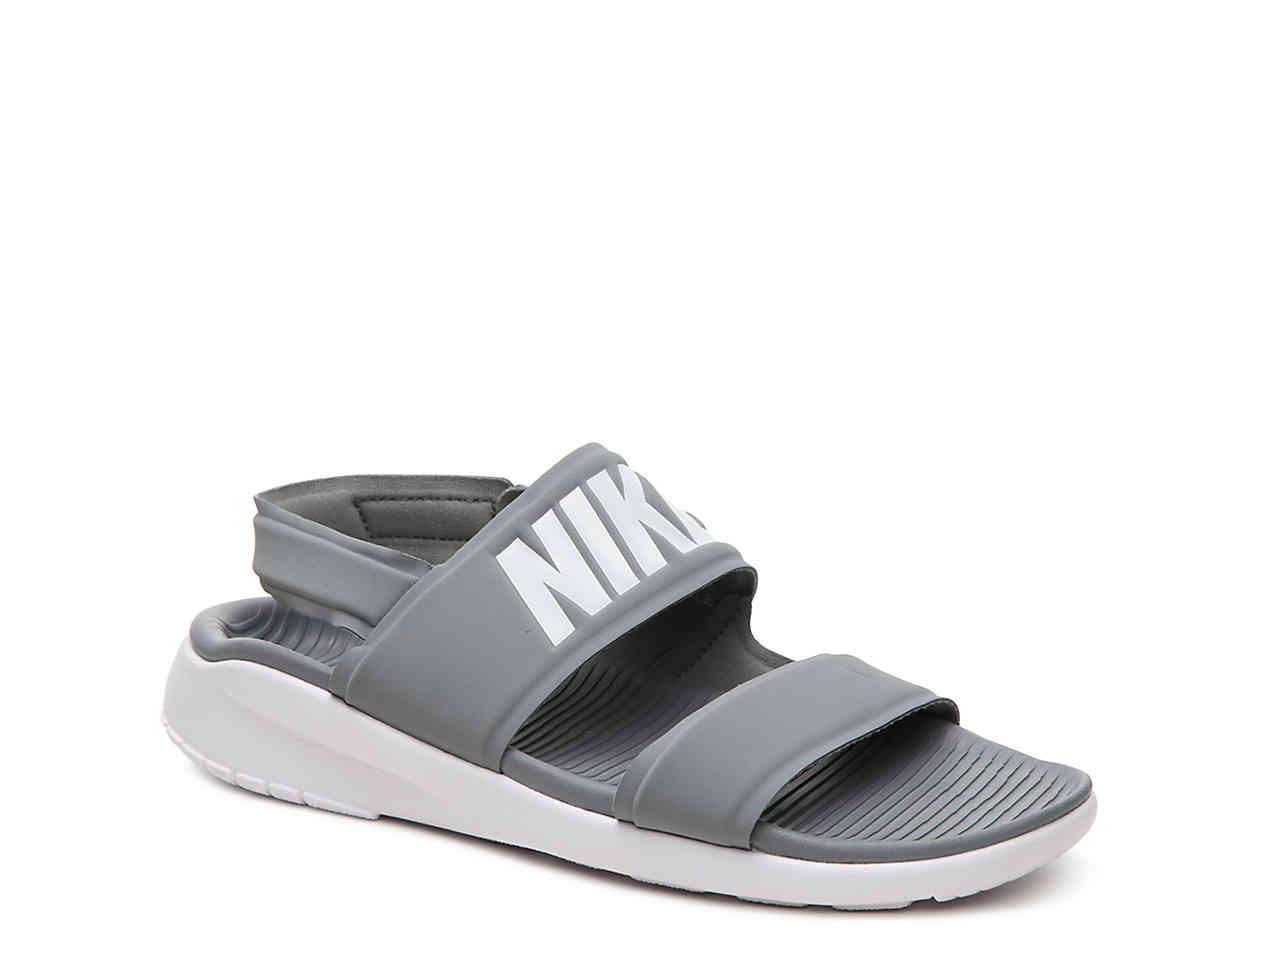 c8d880070e2d Lyst - Nike Tanjun Sport Sandal in Gray